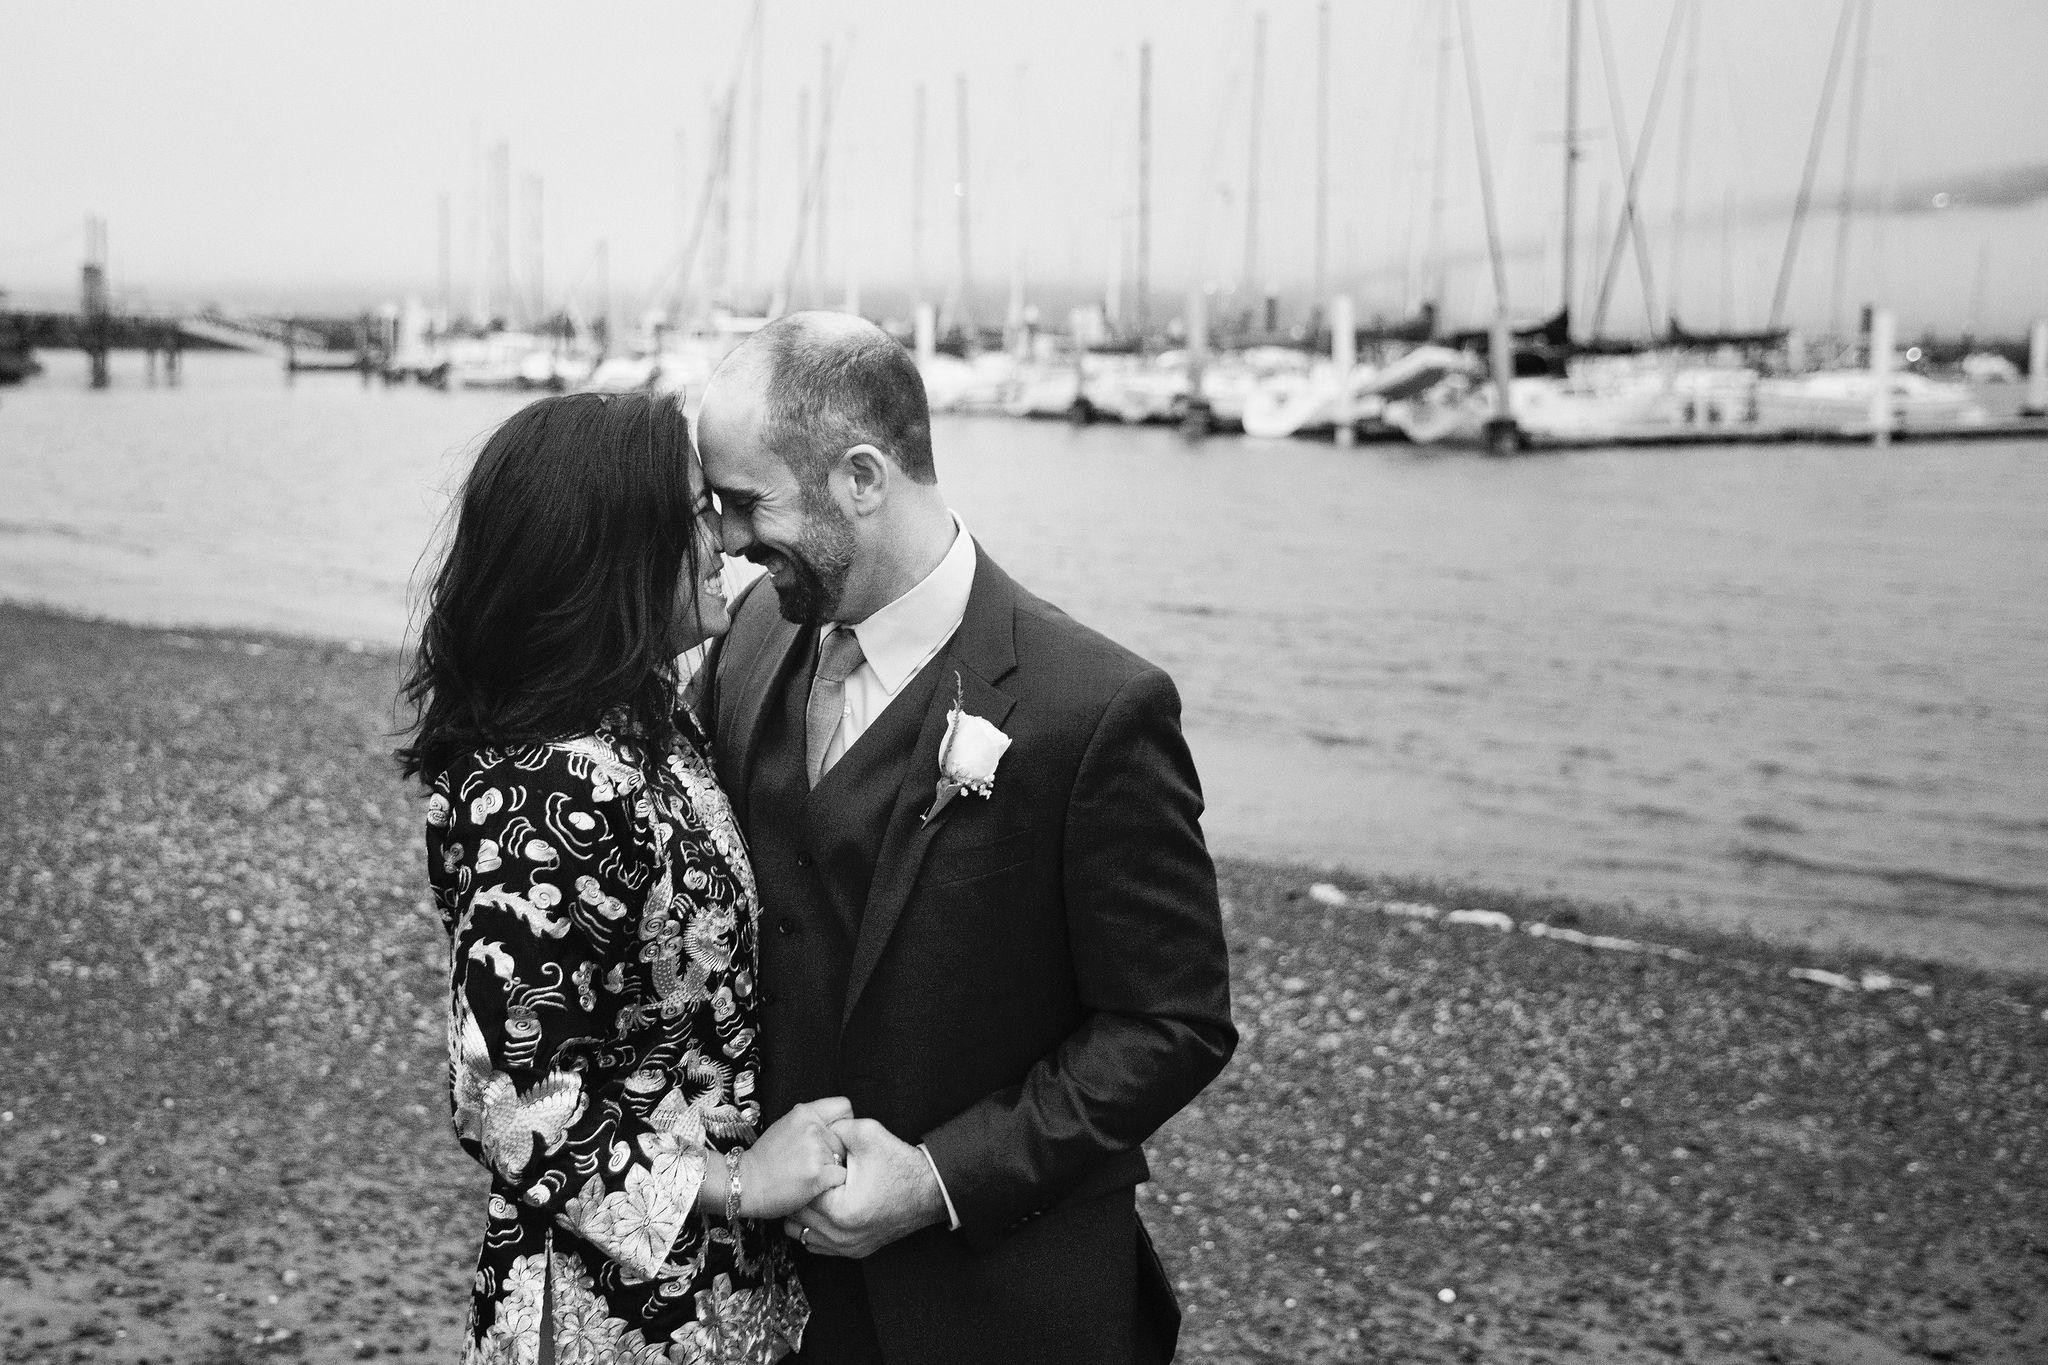 Presidio-Yacht-Club-Wedding-091.JPG